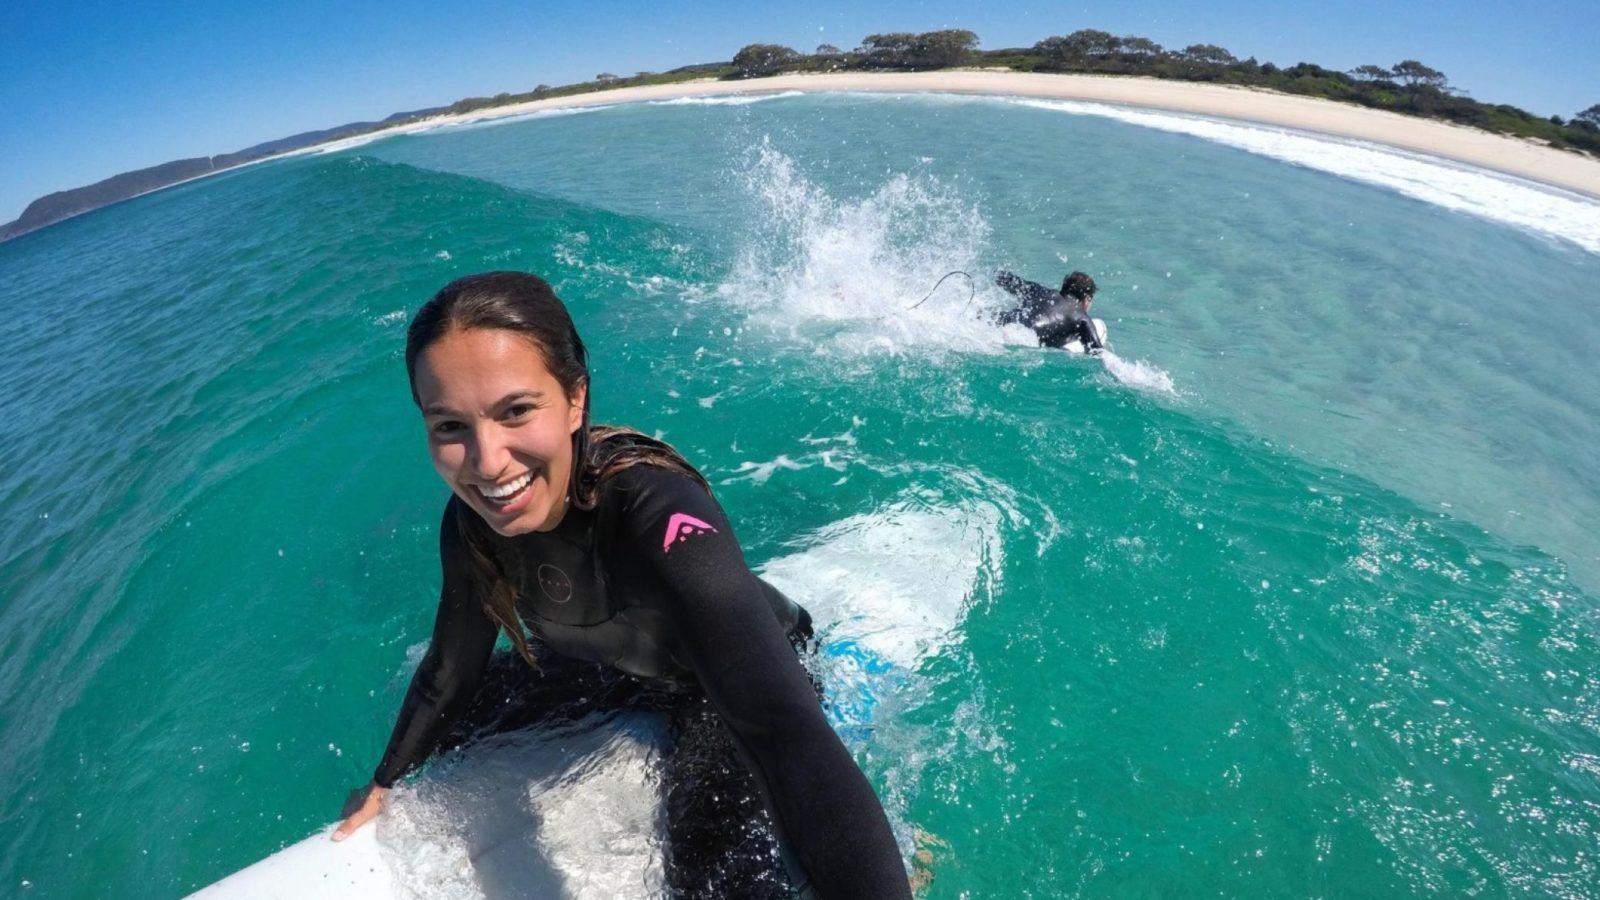 Seven Mile Beach, Forster surfing